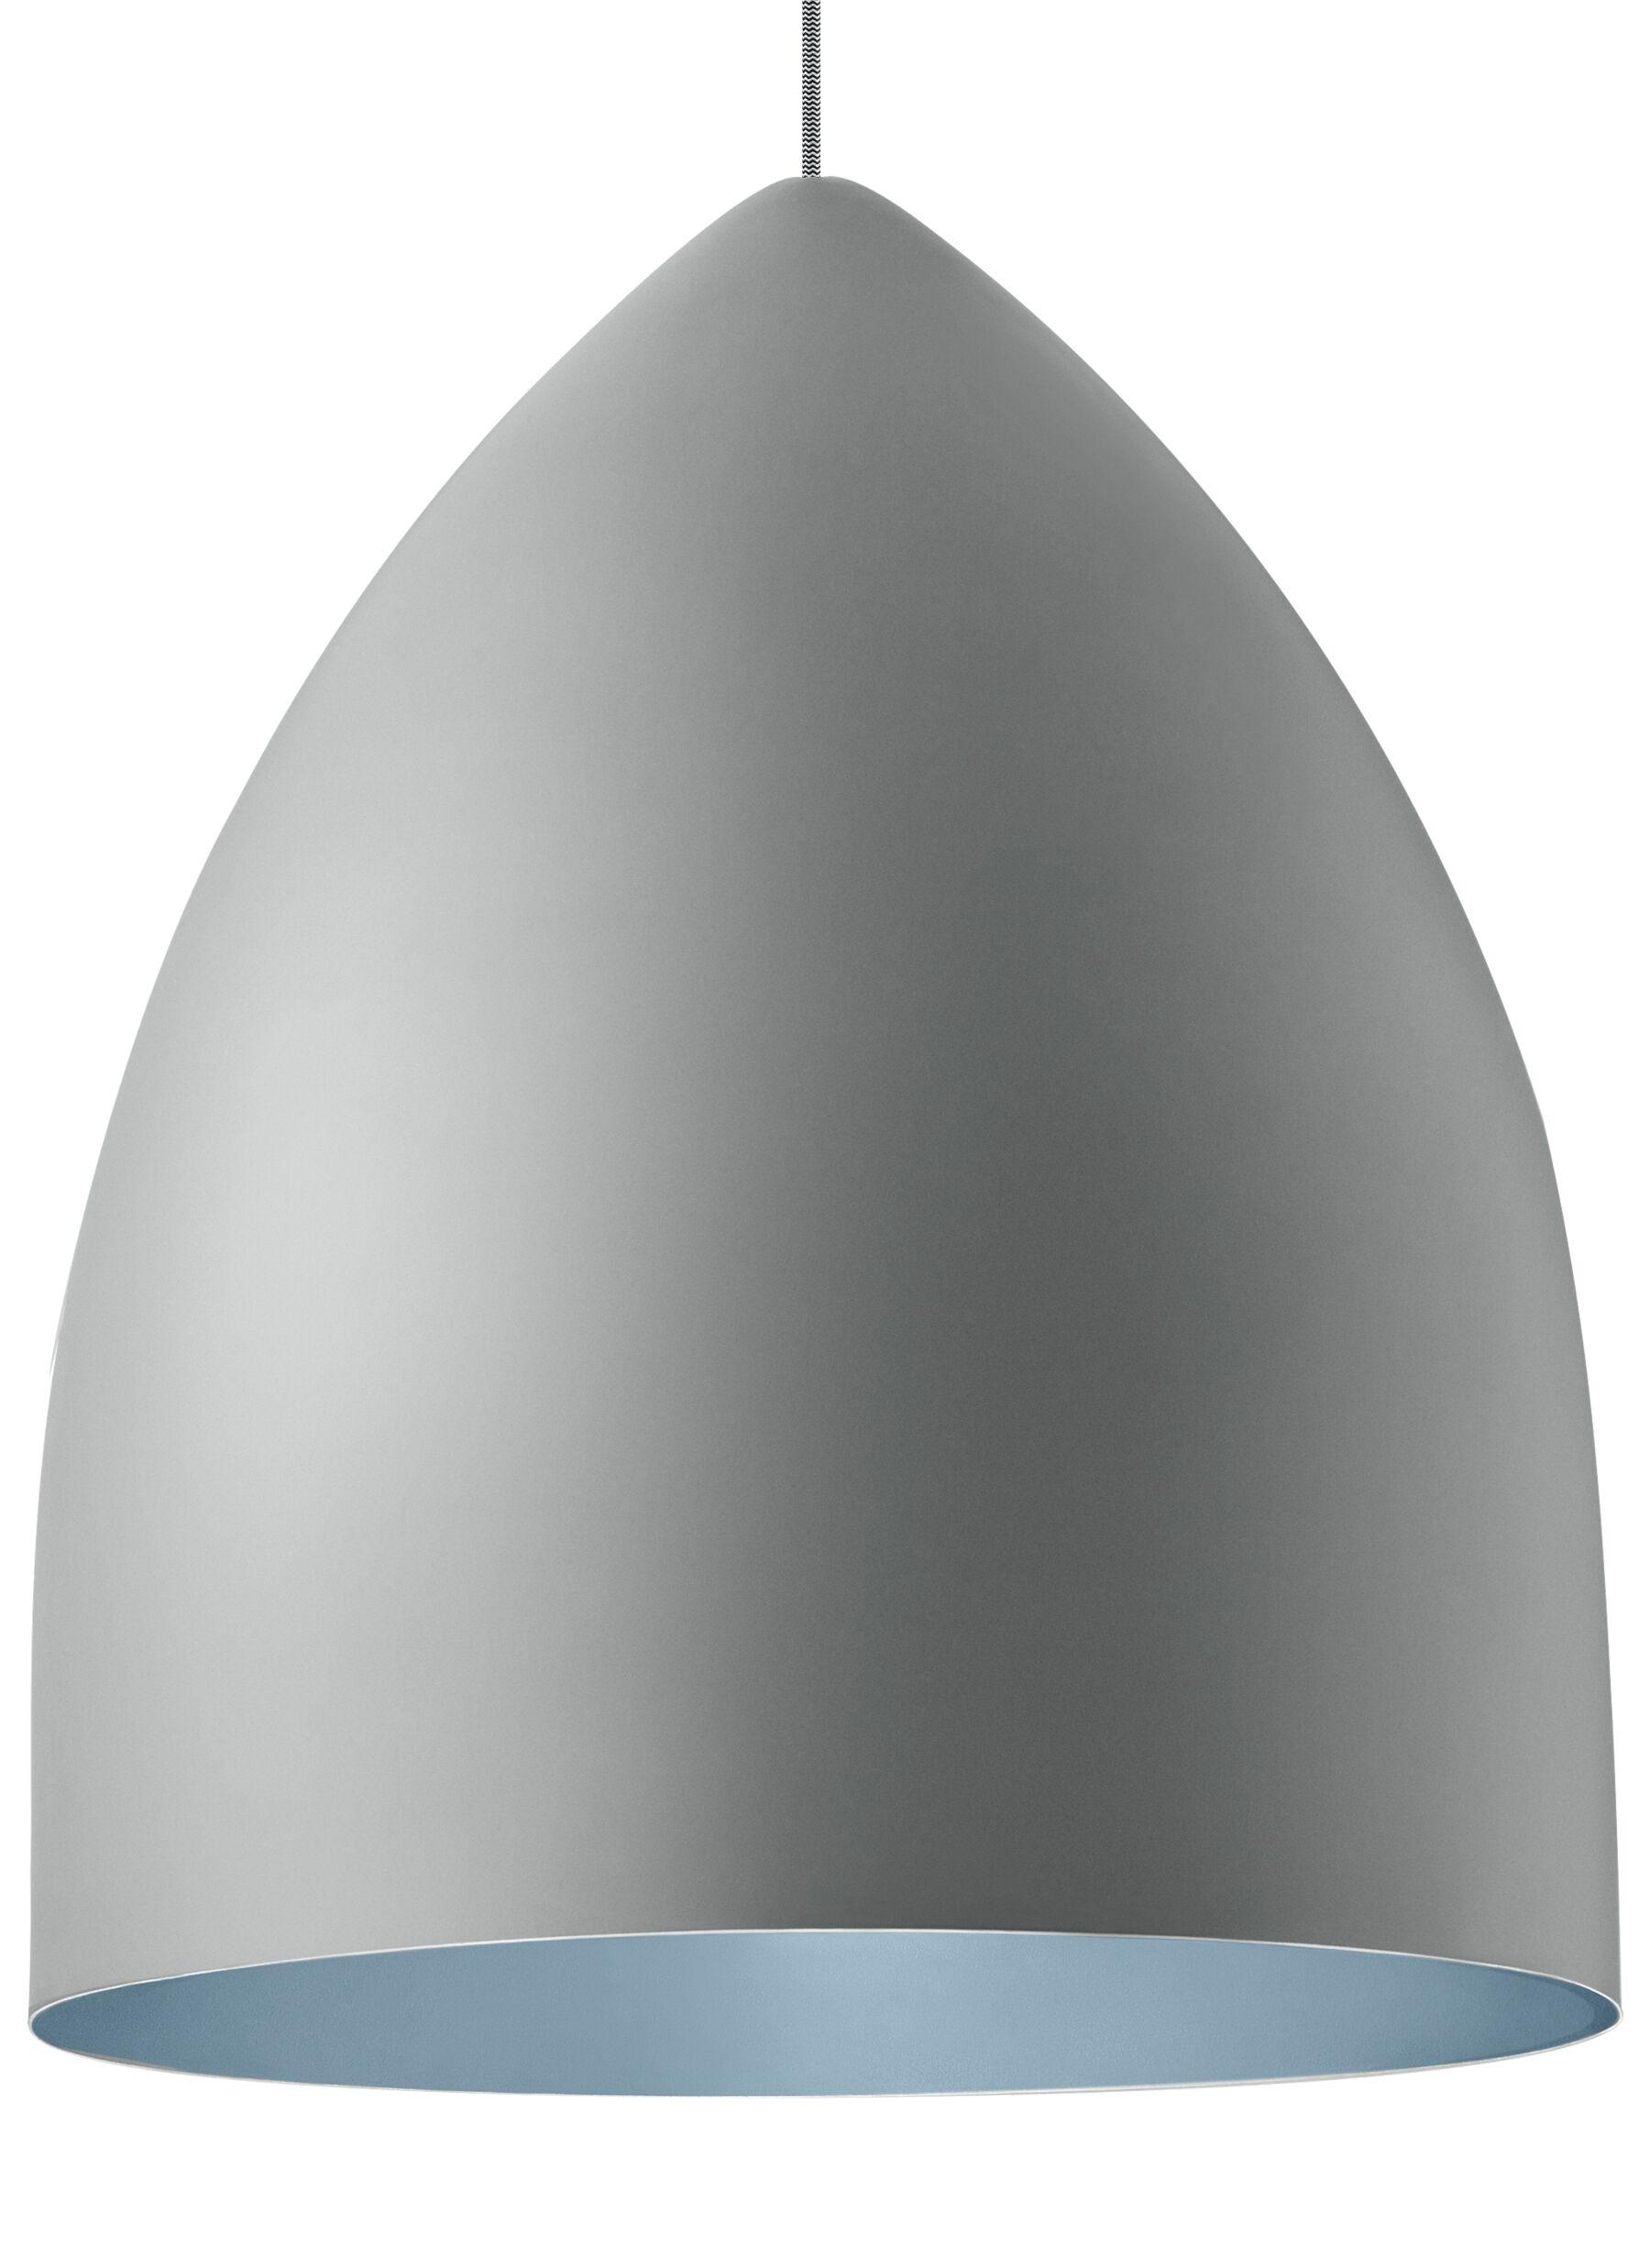 Cybulski 1-Light Cone Pendant Bulb Type: Compact�Fluorescent 277V, Shade Color: Rubberized Gray/Blue